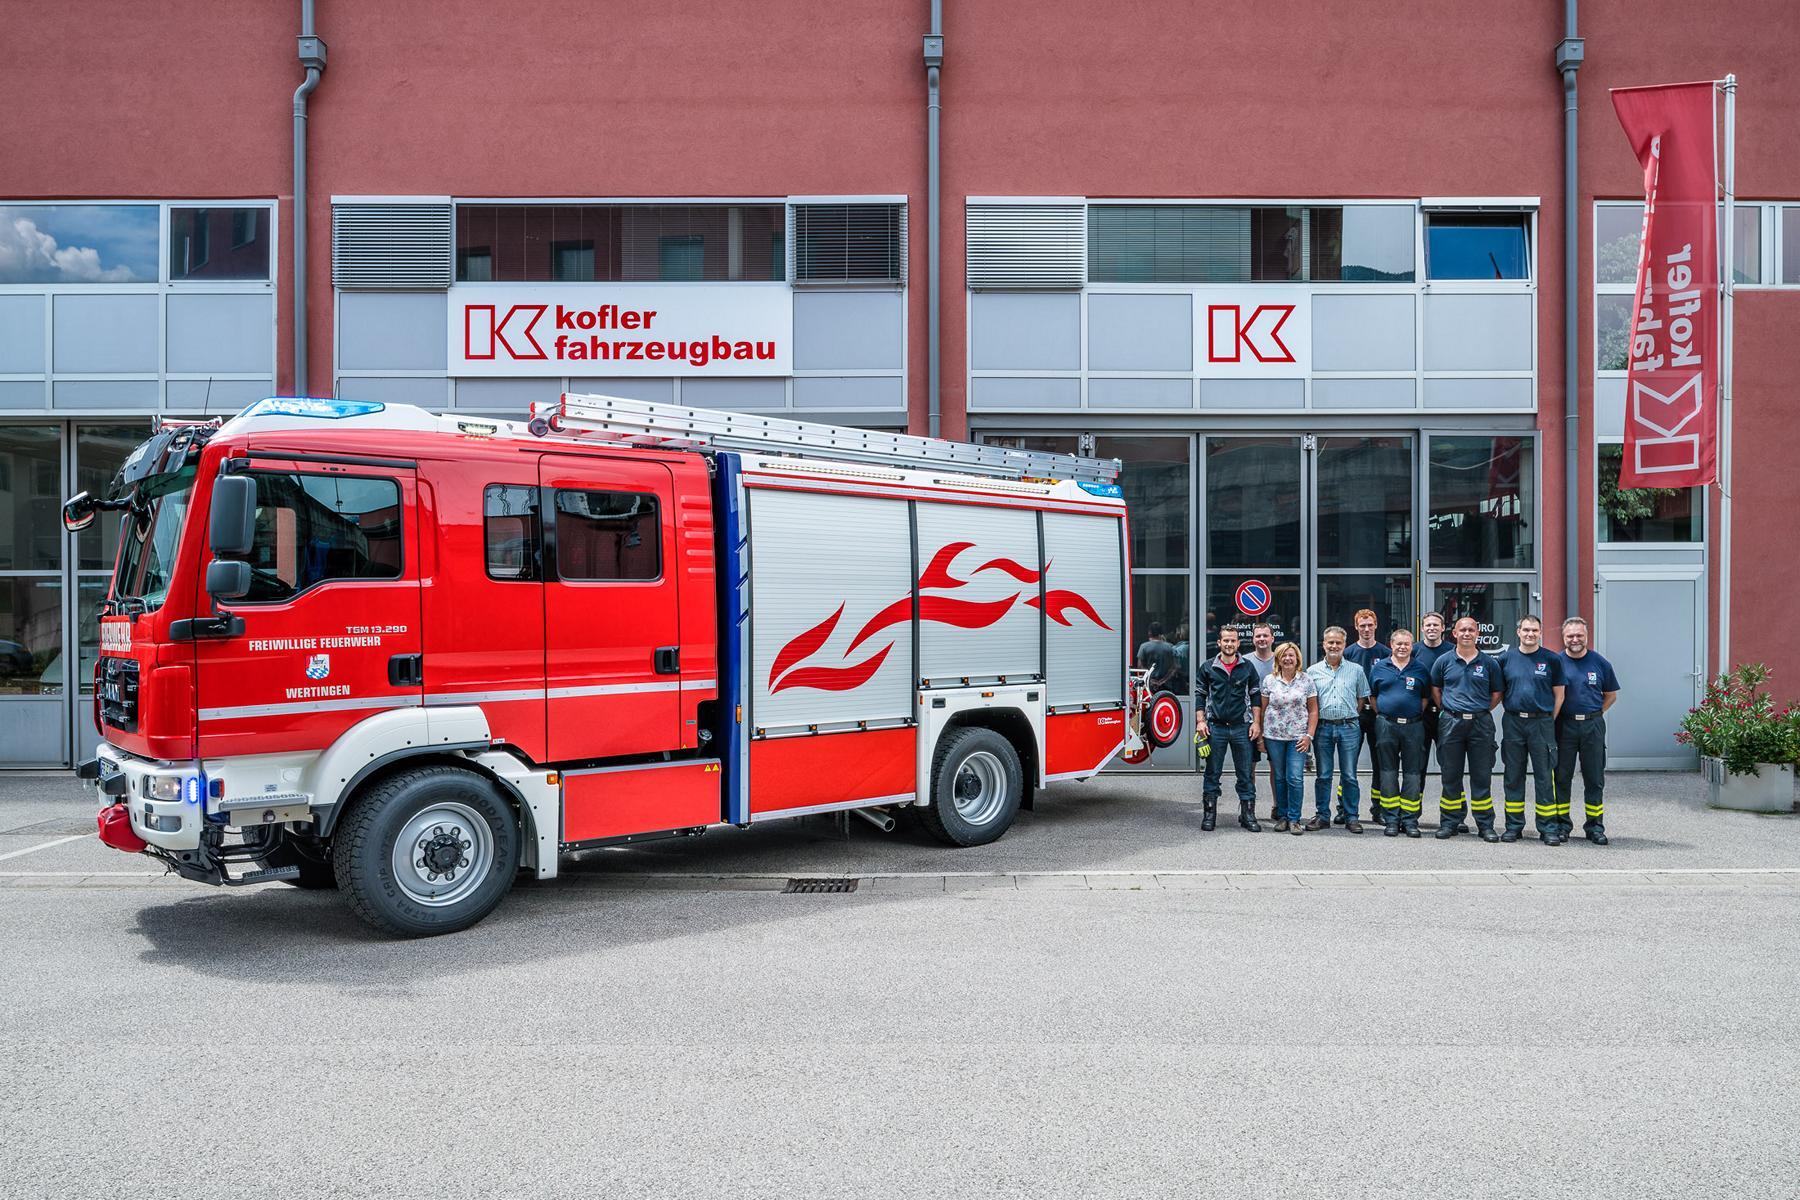 FF-Wertingen-Kofler-Fahrzeugbau